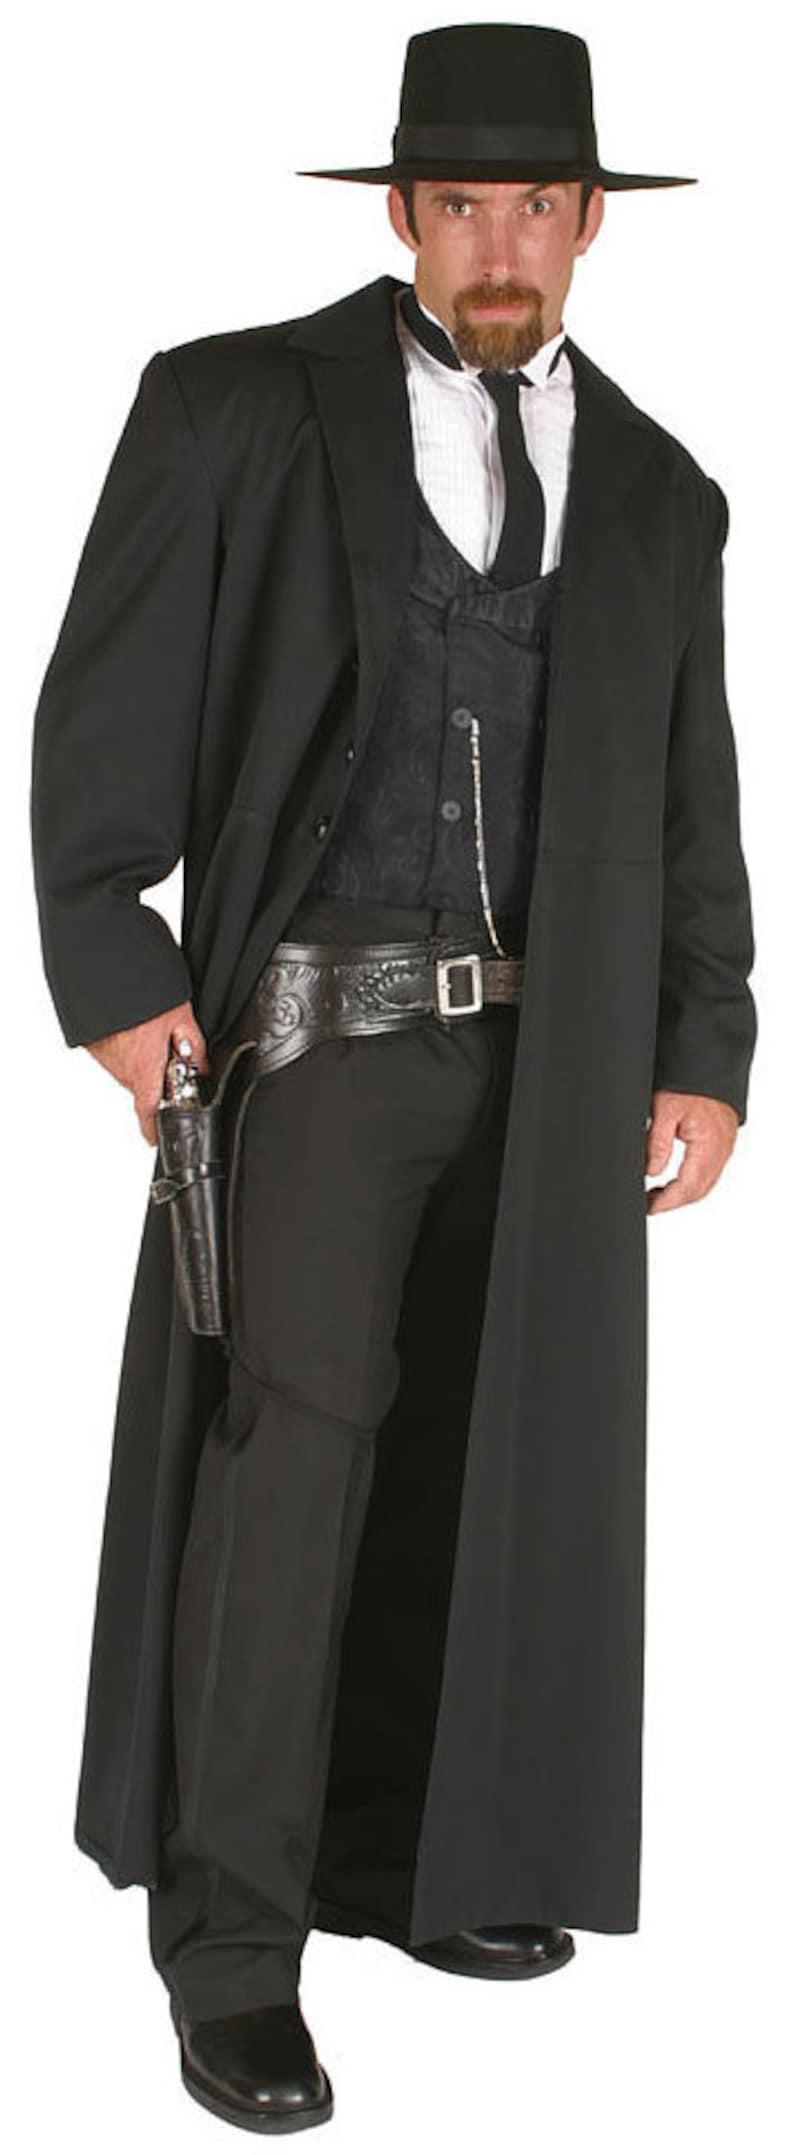 Victorian Men's Costumes: Mad Hatter, Rhet Butler, Willy Wonka Wyatt Earp Western Costume $246.97 AT vintagedancer.com